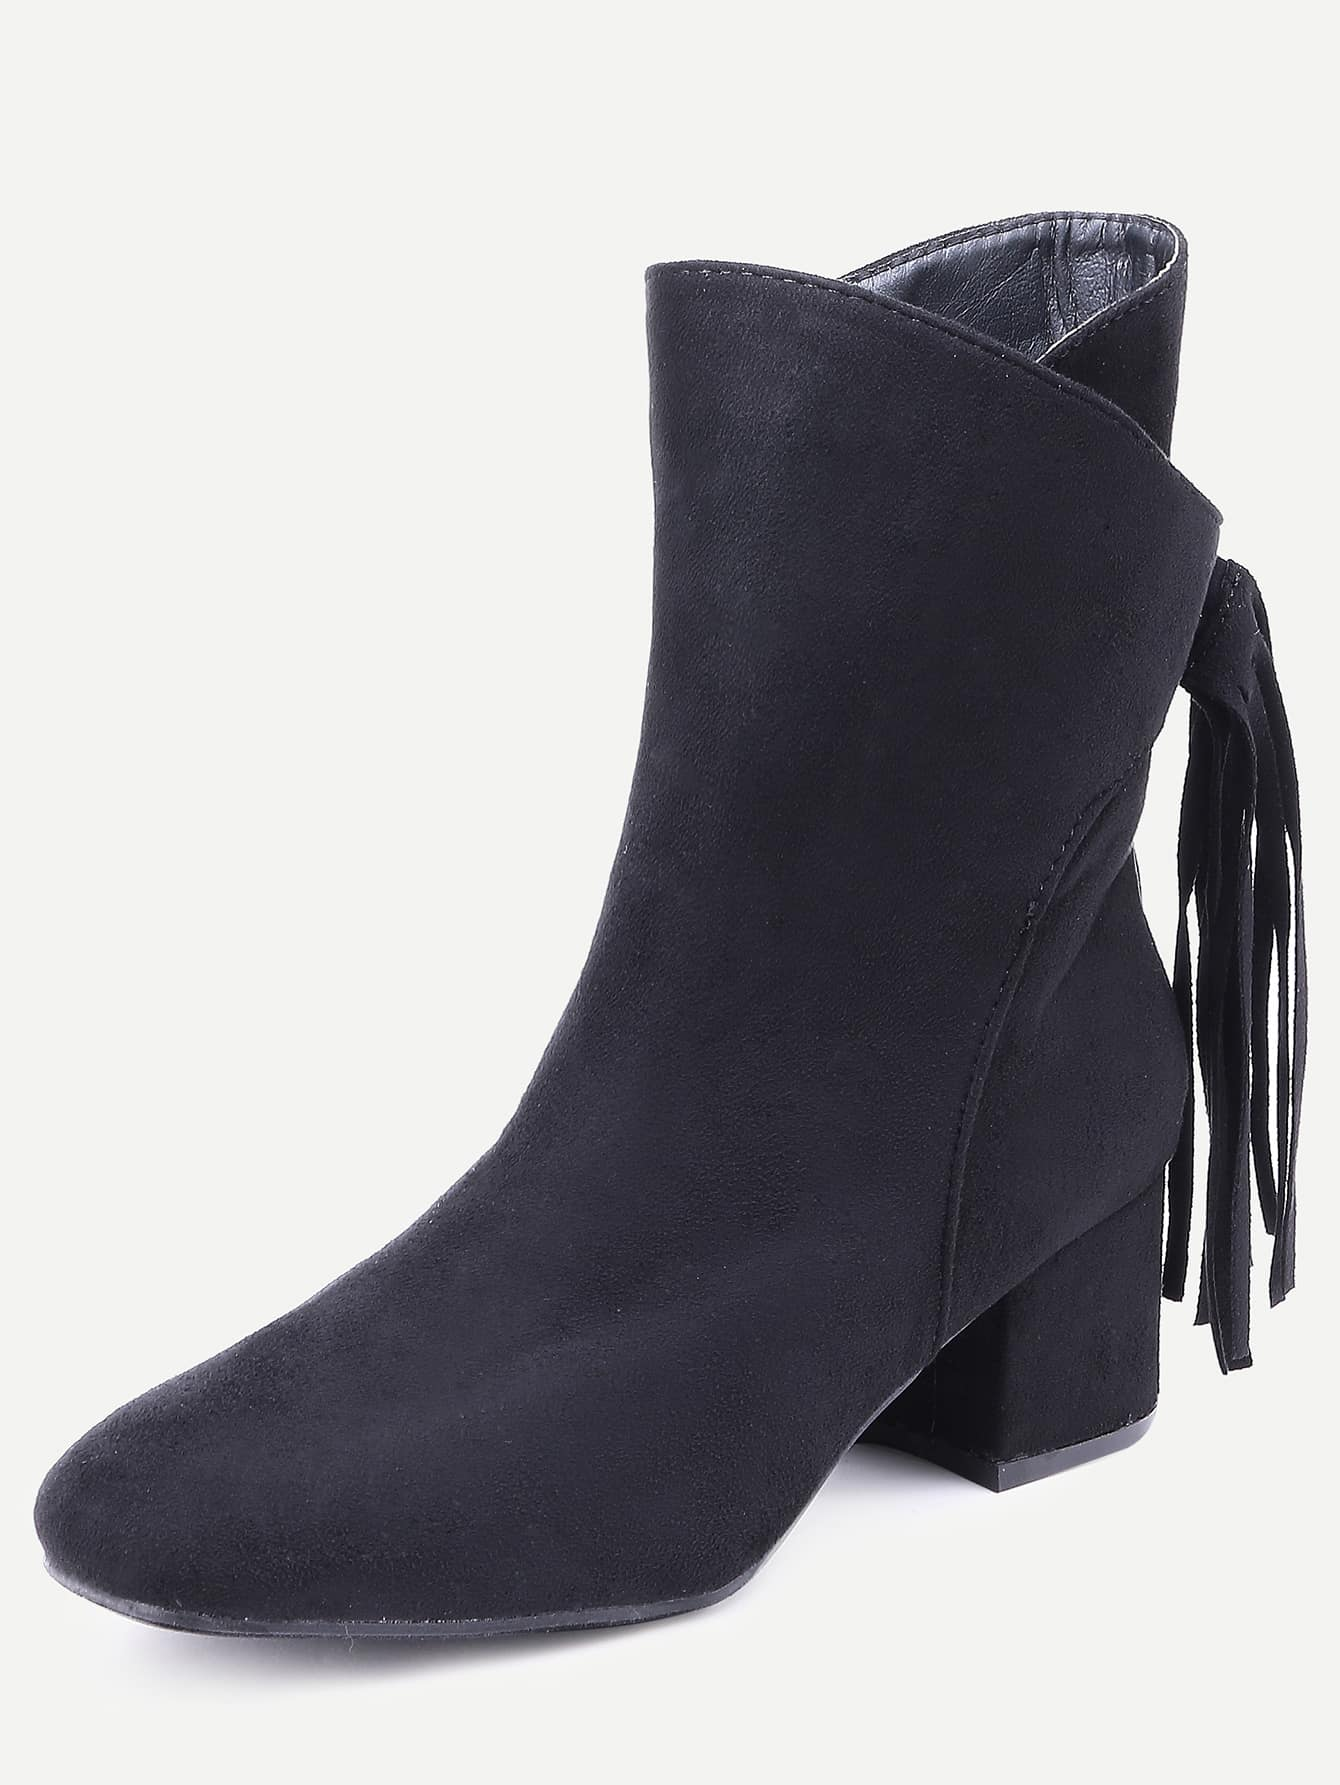 black suede fringe point toe boots shein sheinside